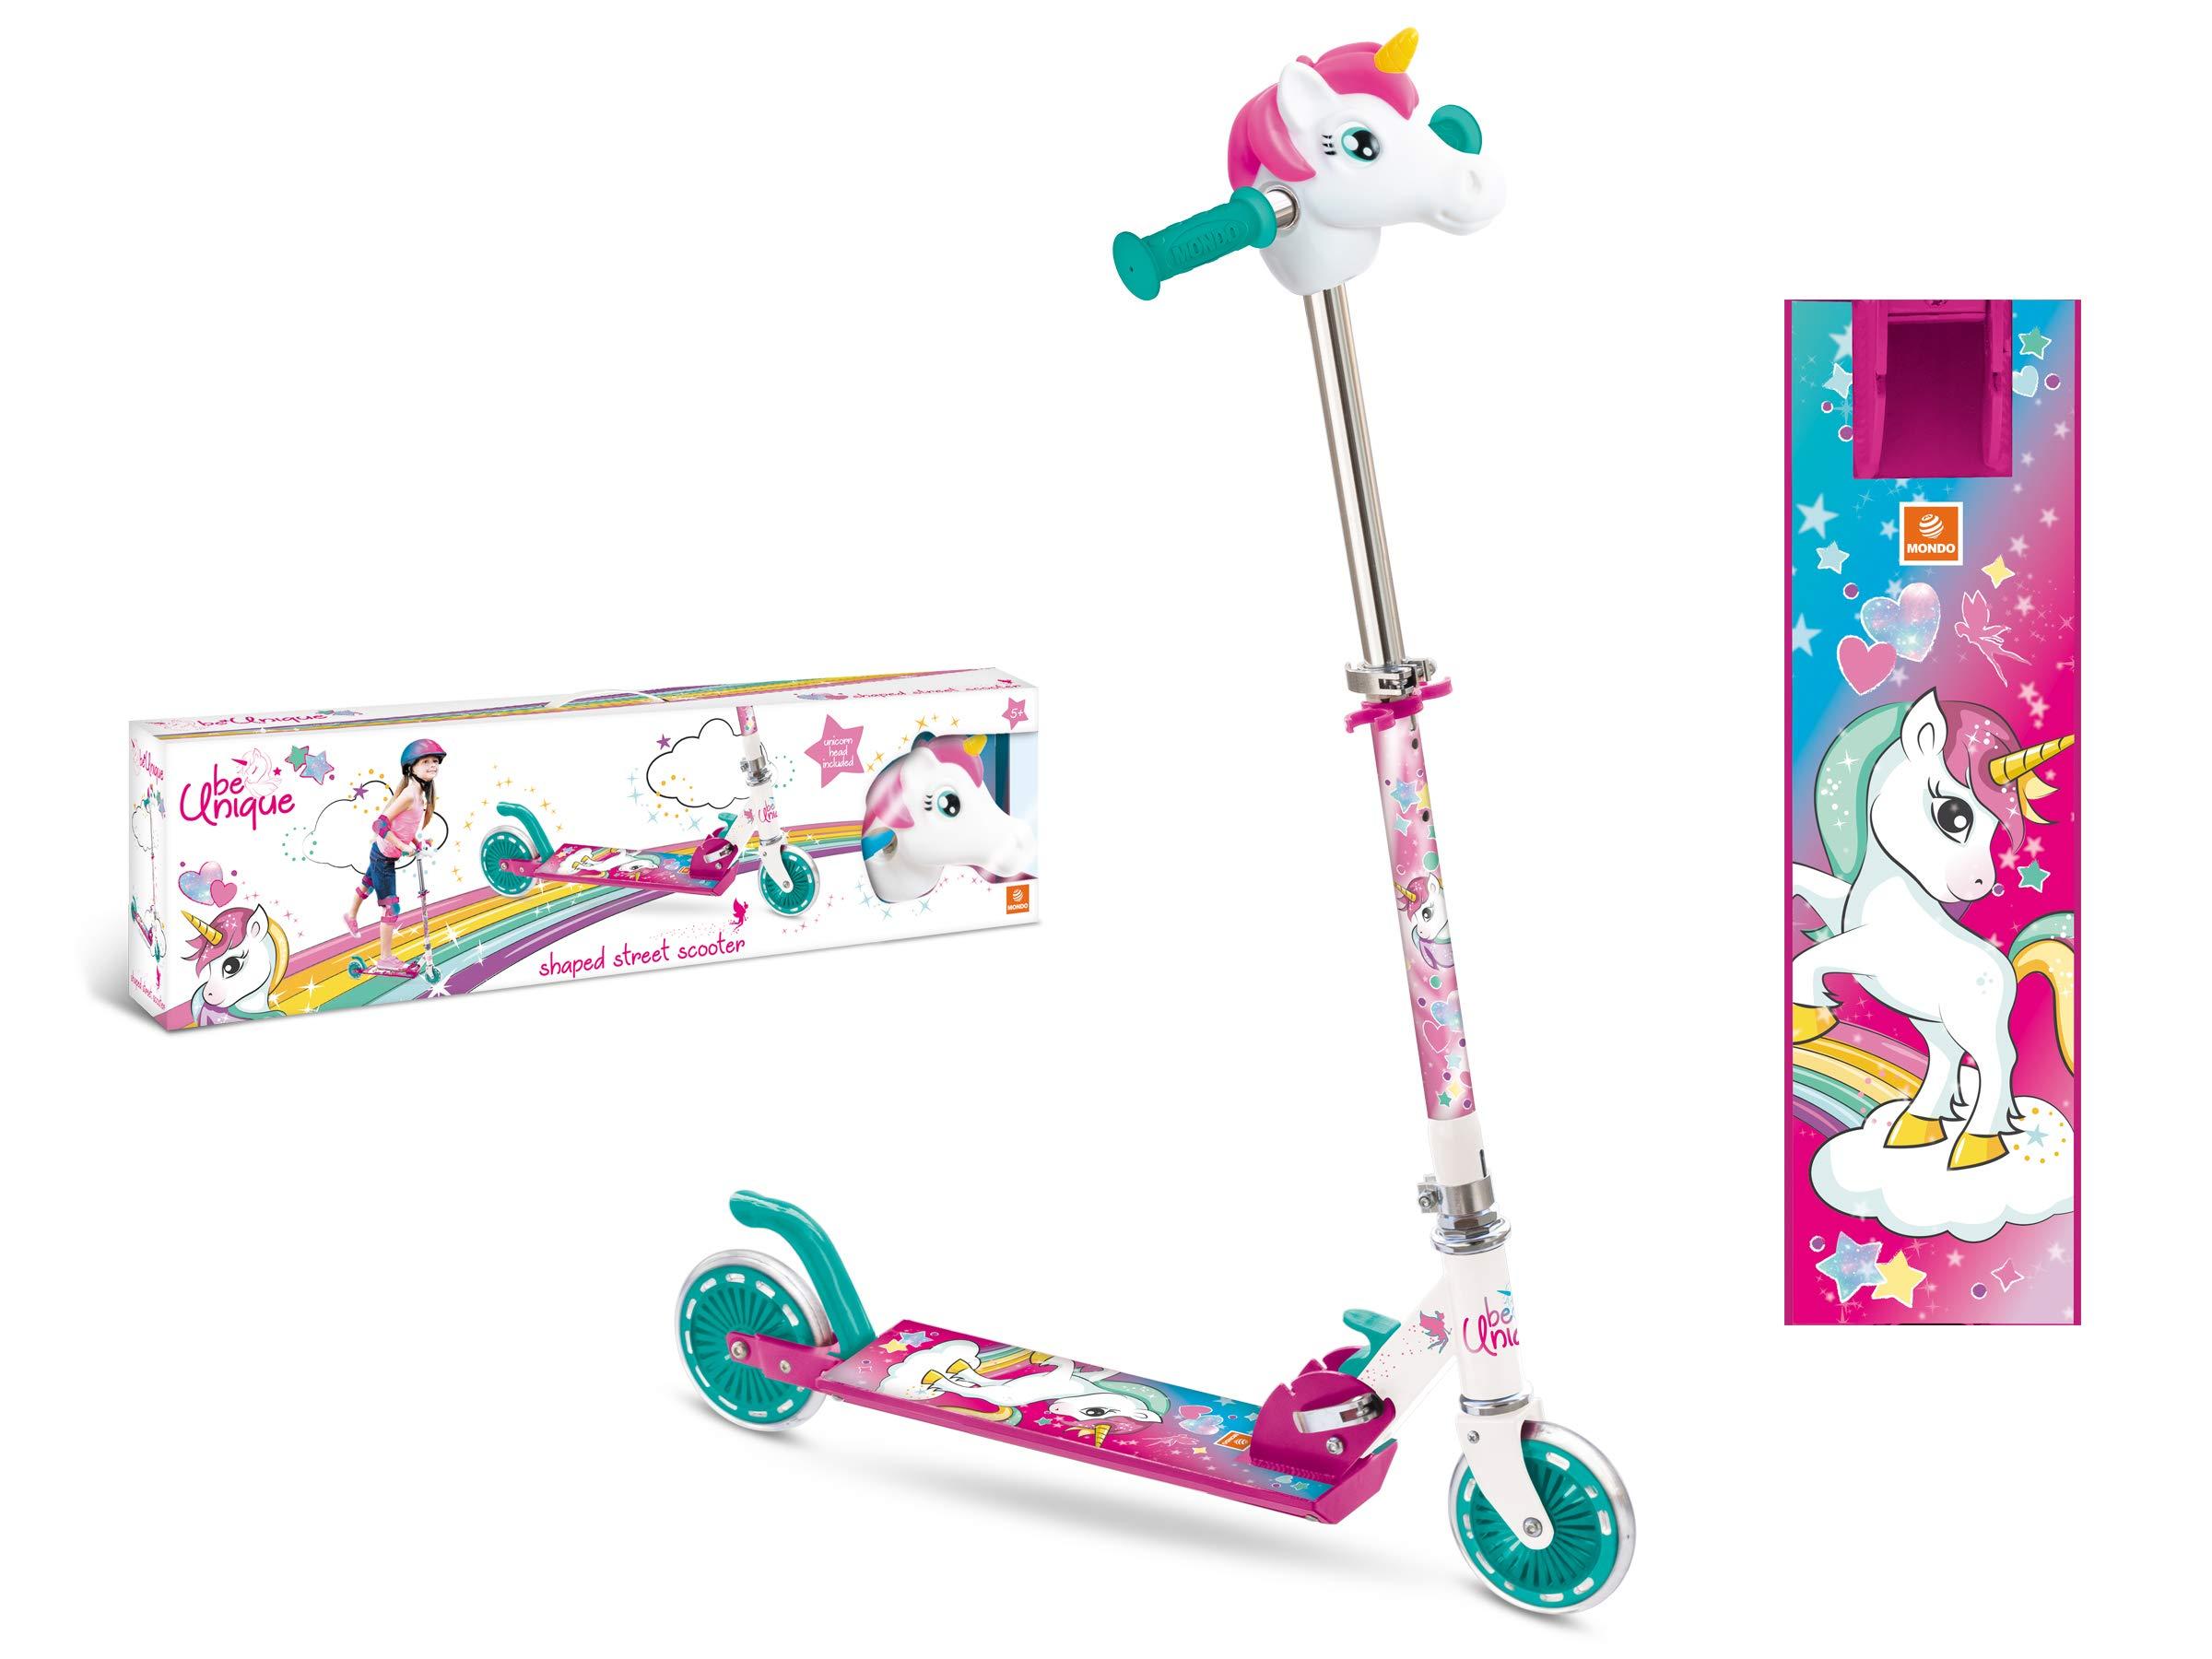 Mondo-28328 Unicorn Scooter Pink 28328